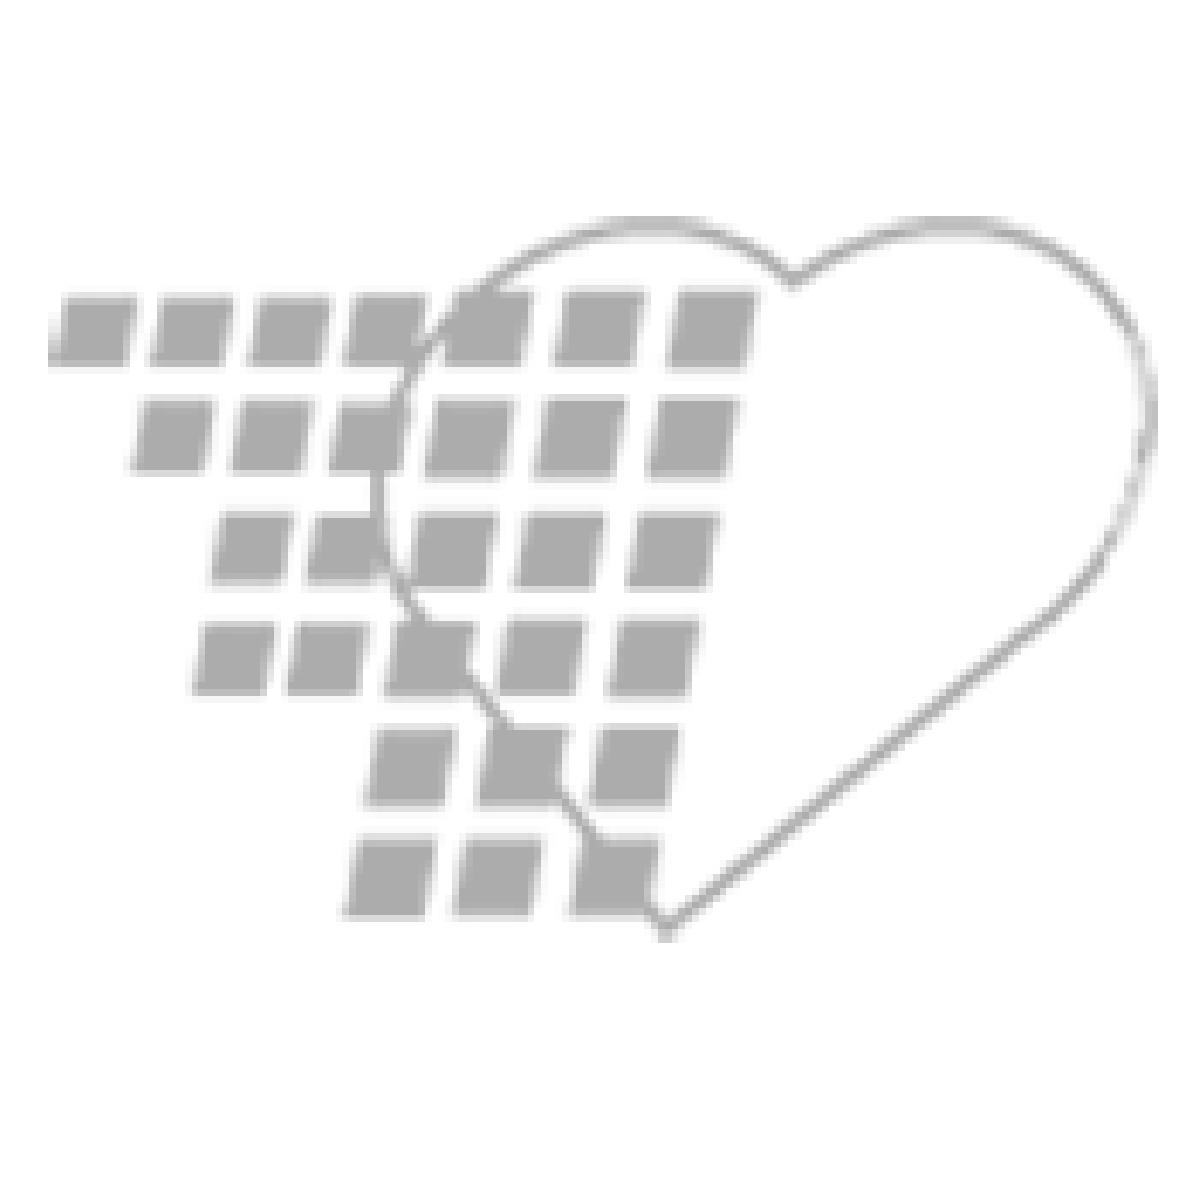 06-54-0059-REFURB - Refurbished Hospira Plumb A+ Infusion Pump